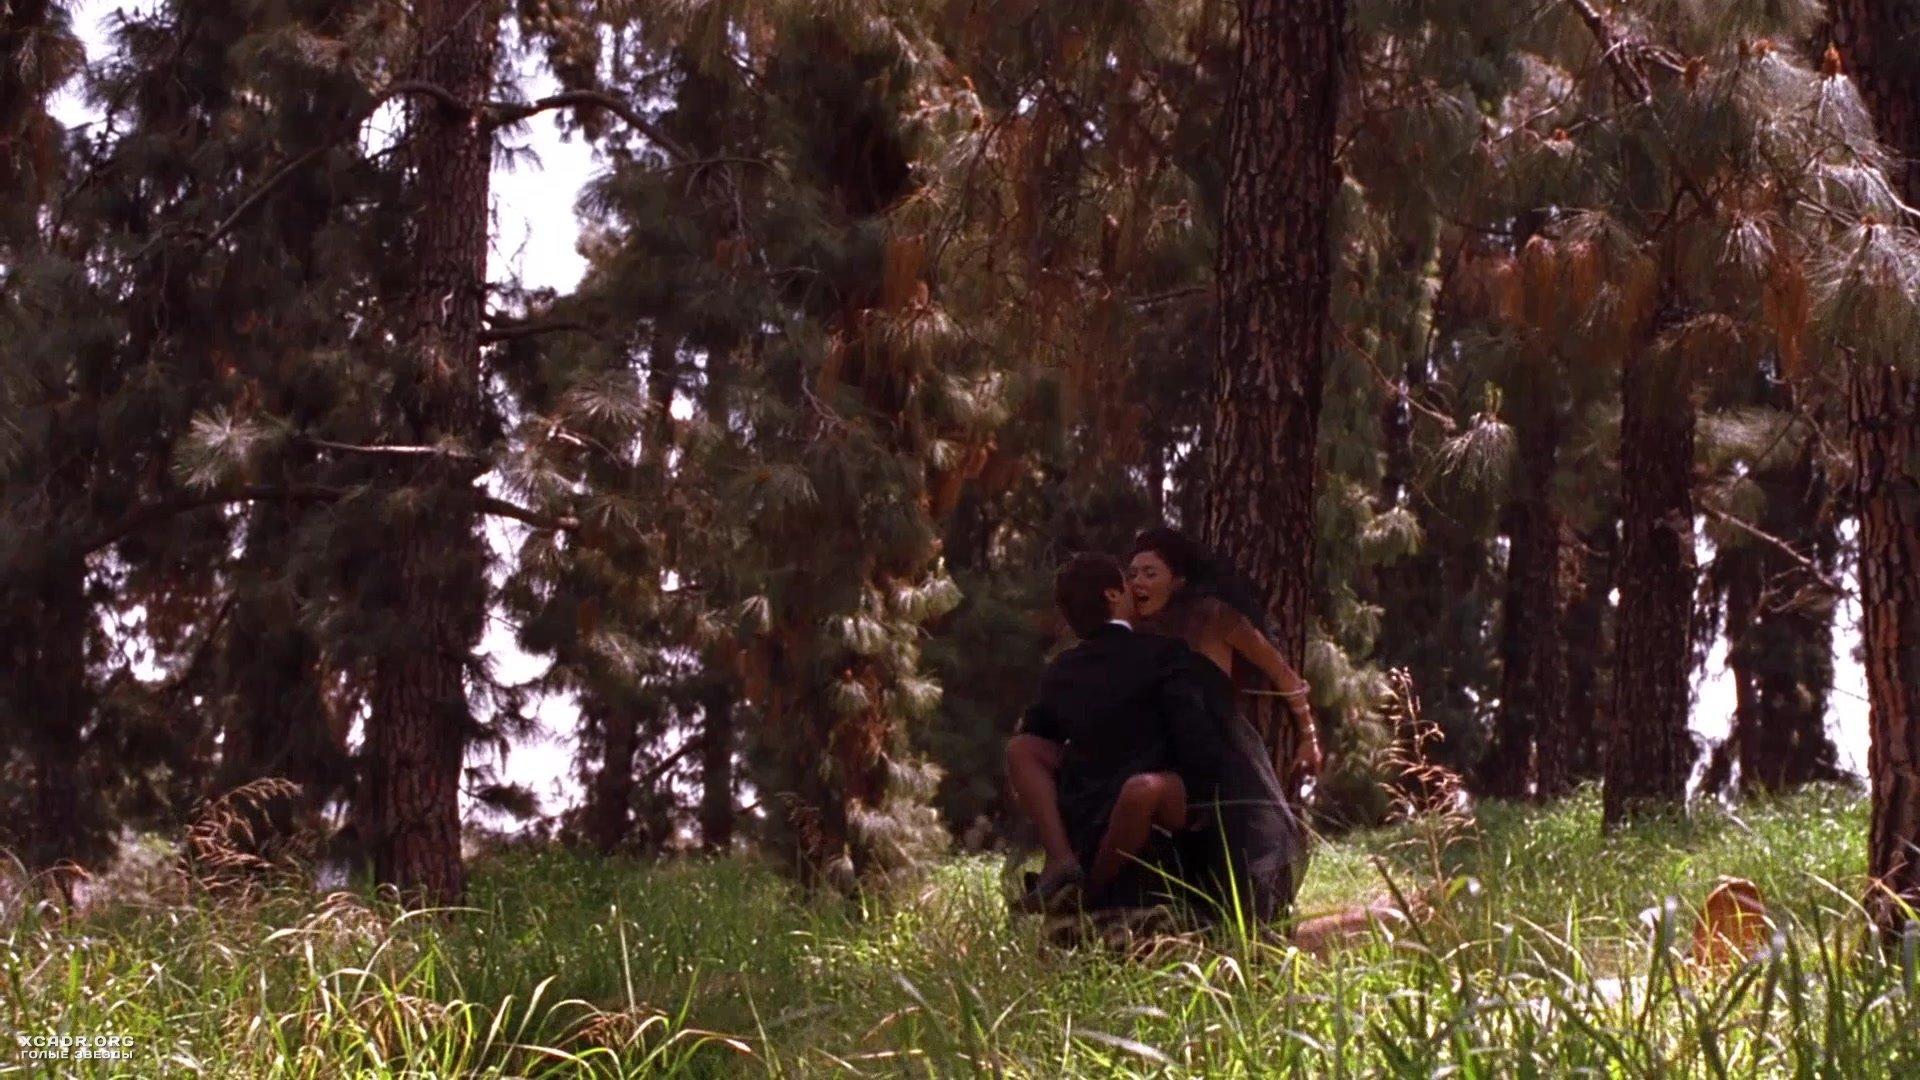 Секретарша в лесу фото 463-618